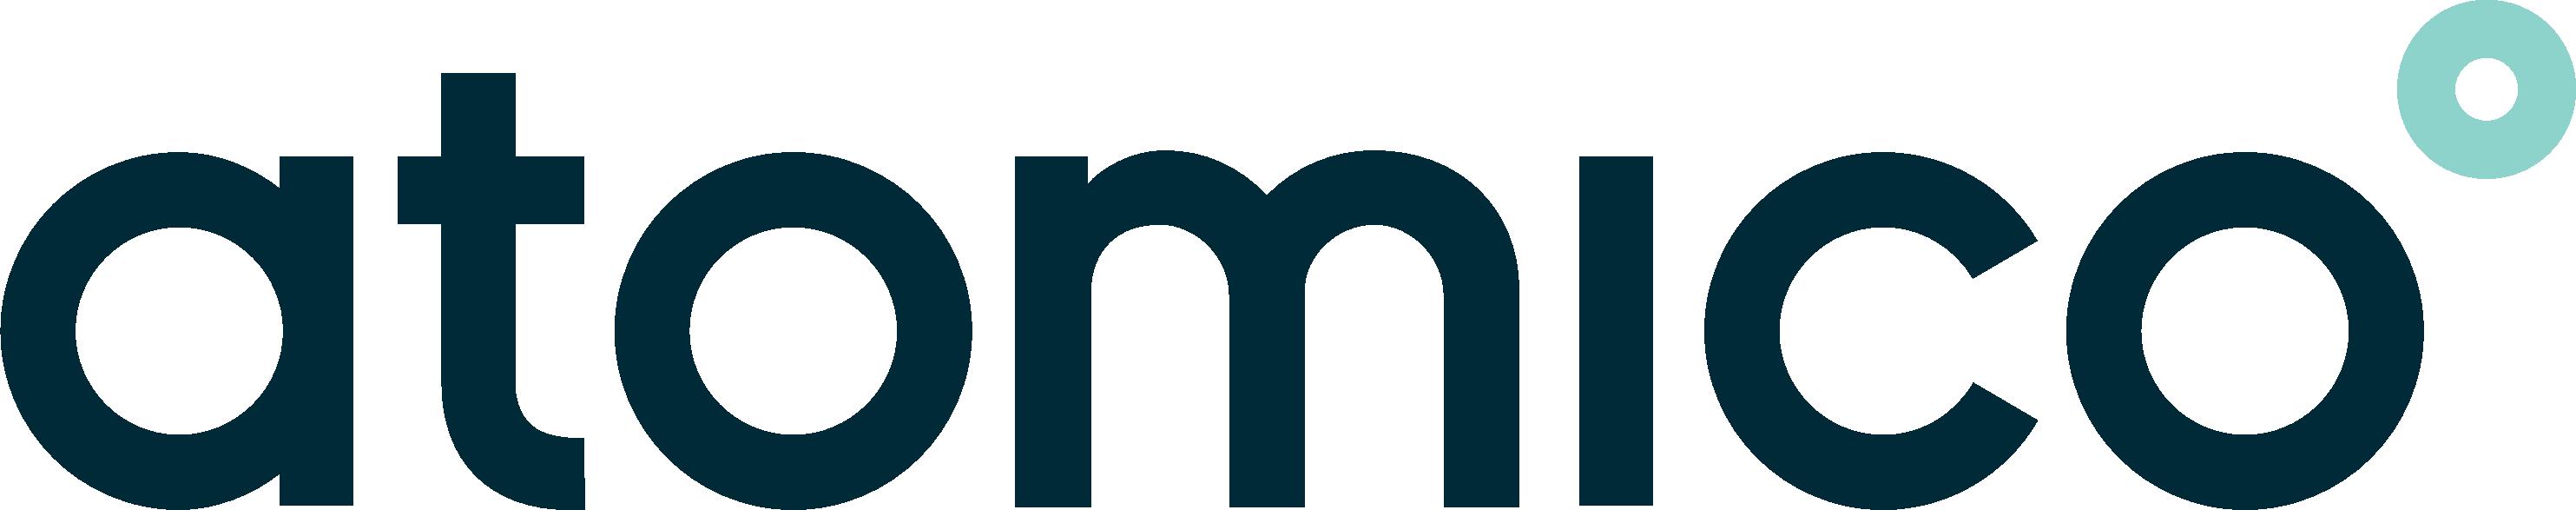 File:Atomico.png - Wikipedia